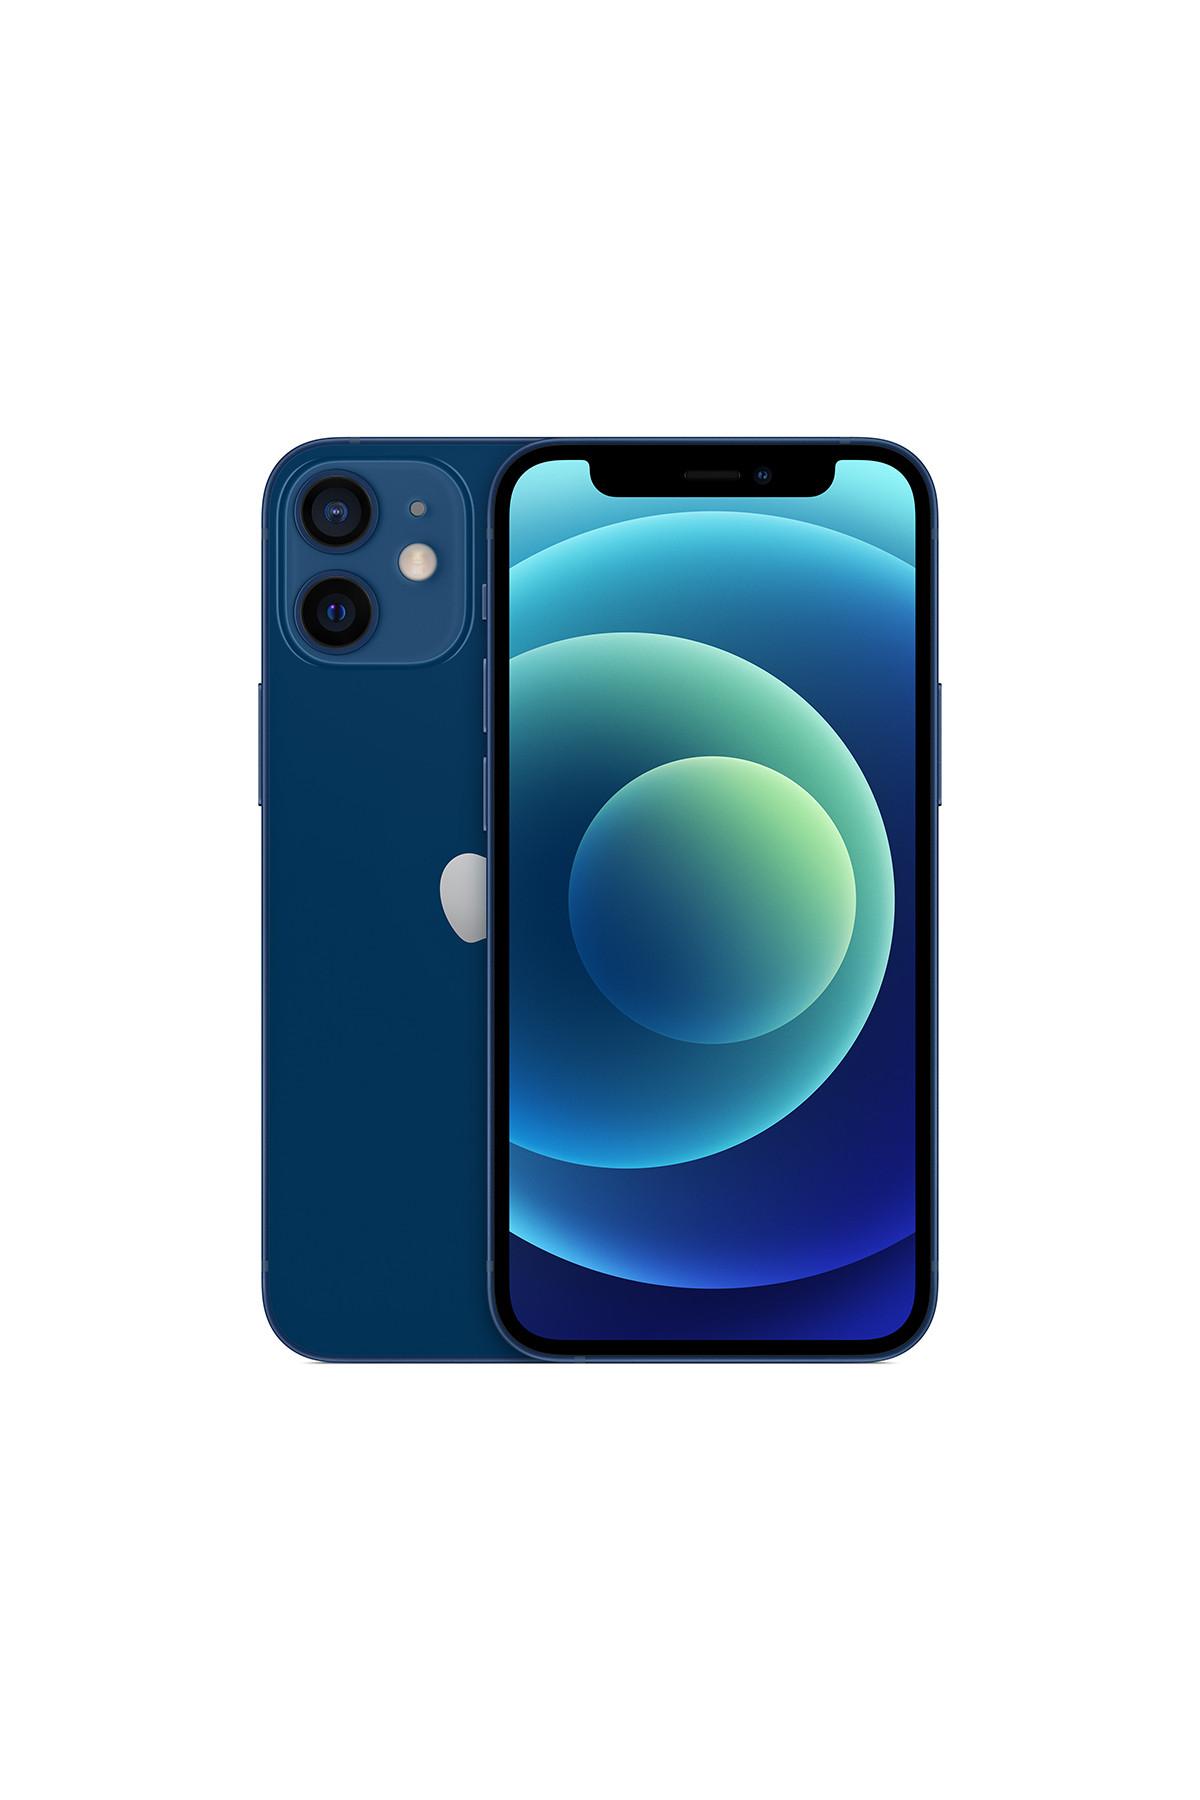 iPhone 12 Mini 128GB - Blue